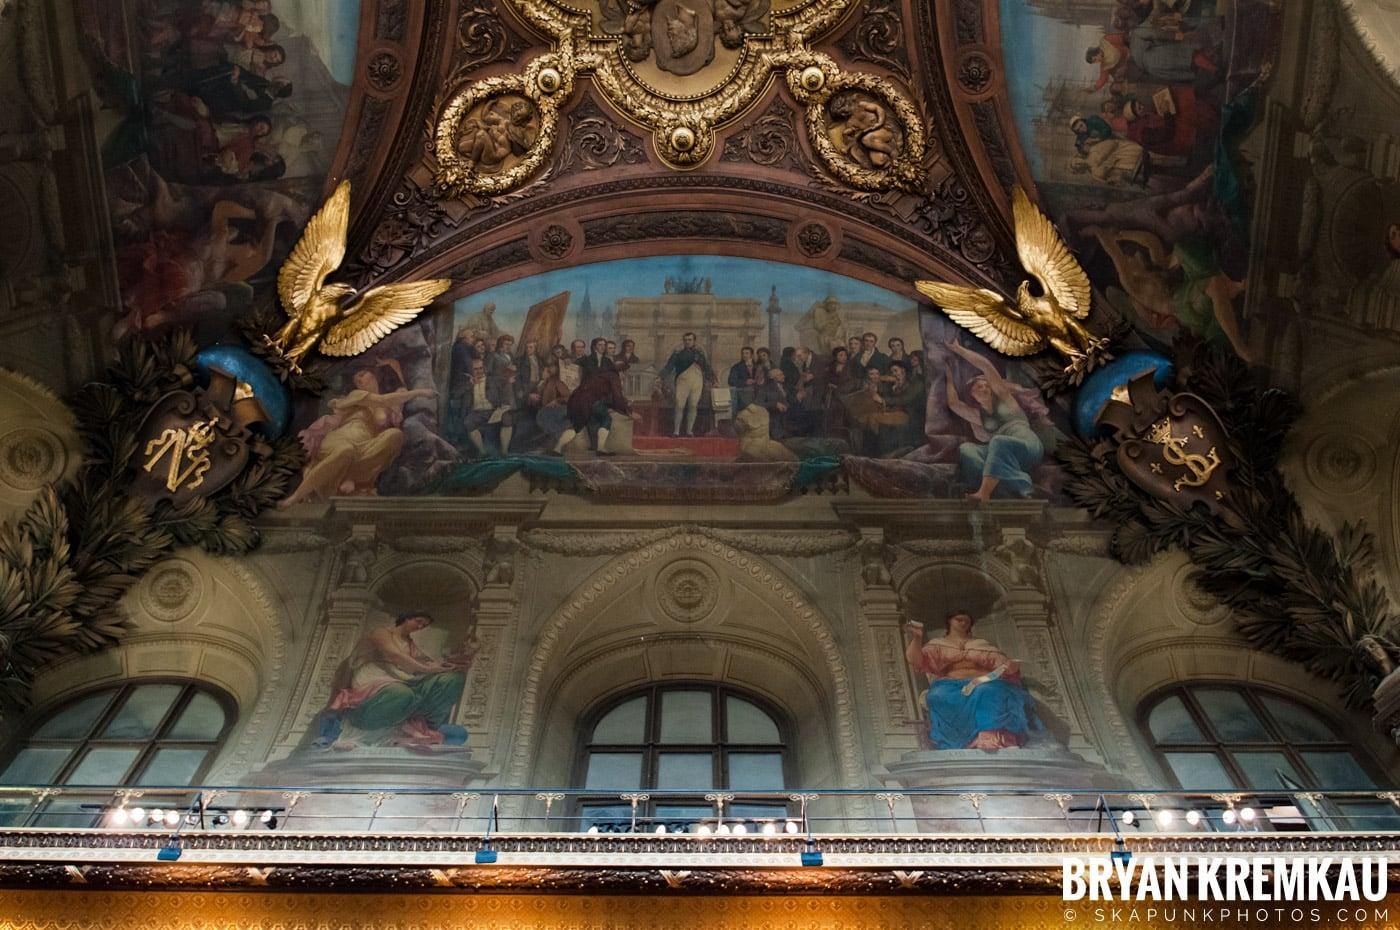 Paris, France Honeymoon - Day 4 - 7.21.11 (16)